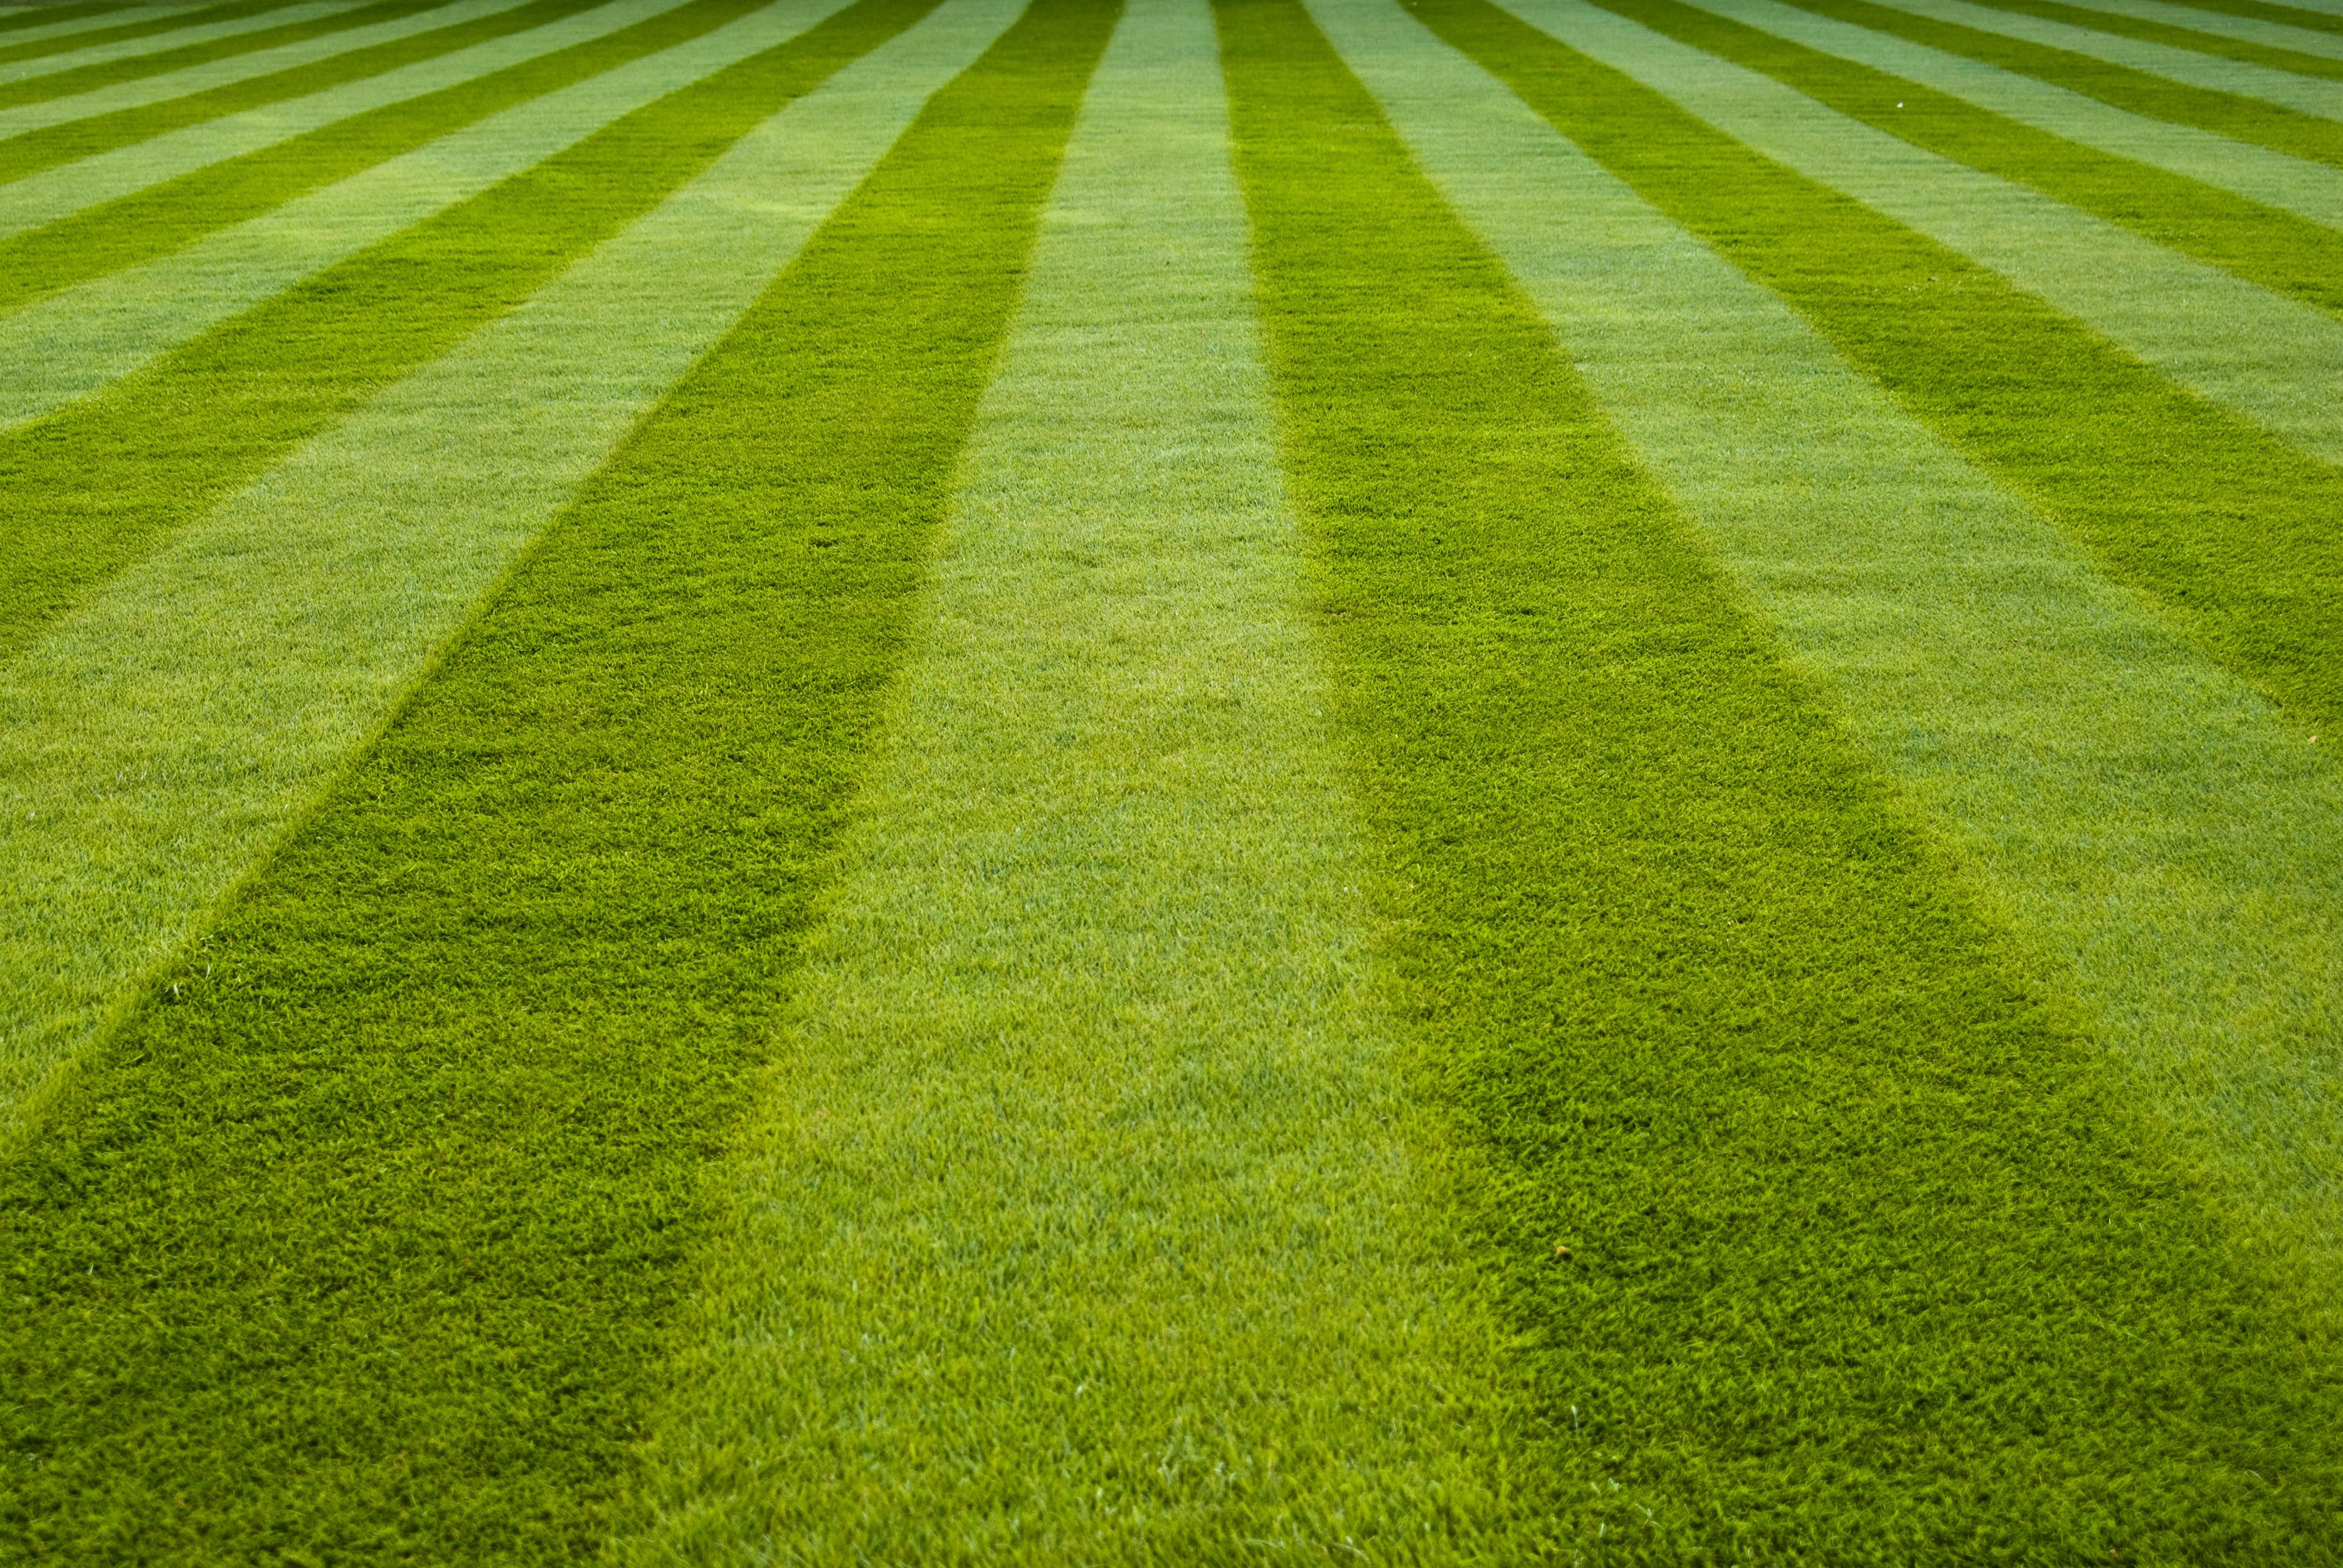 All grass is green, a helpful stress management philosophy.